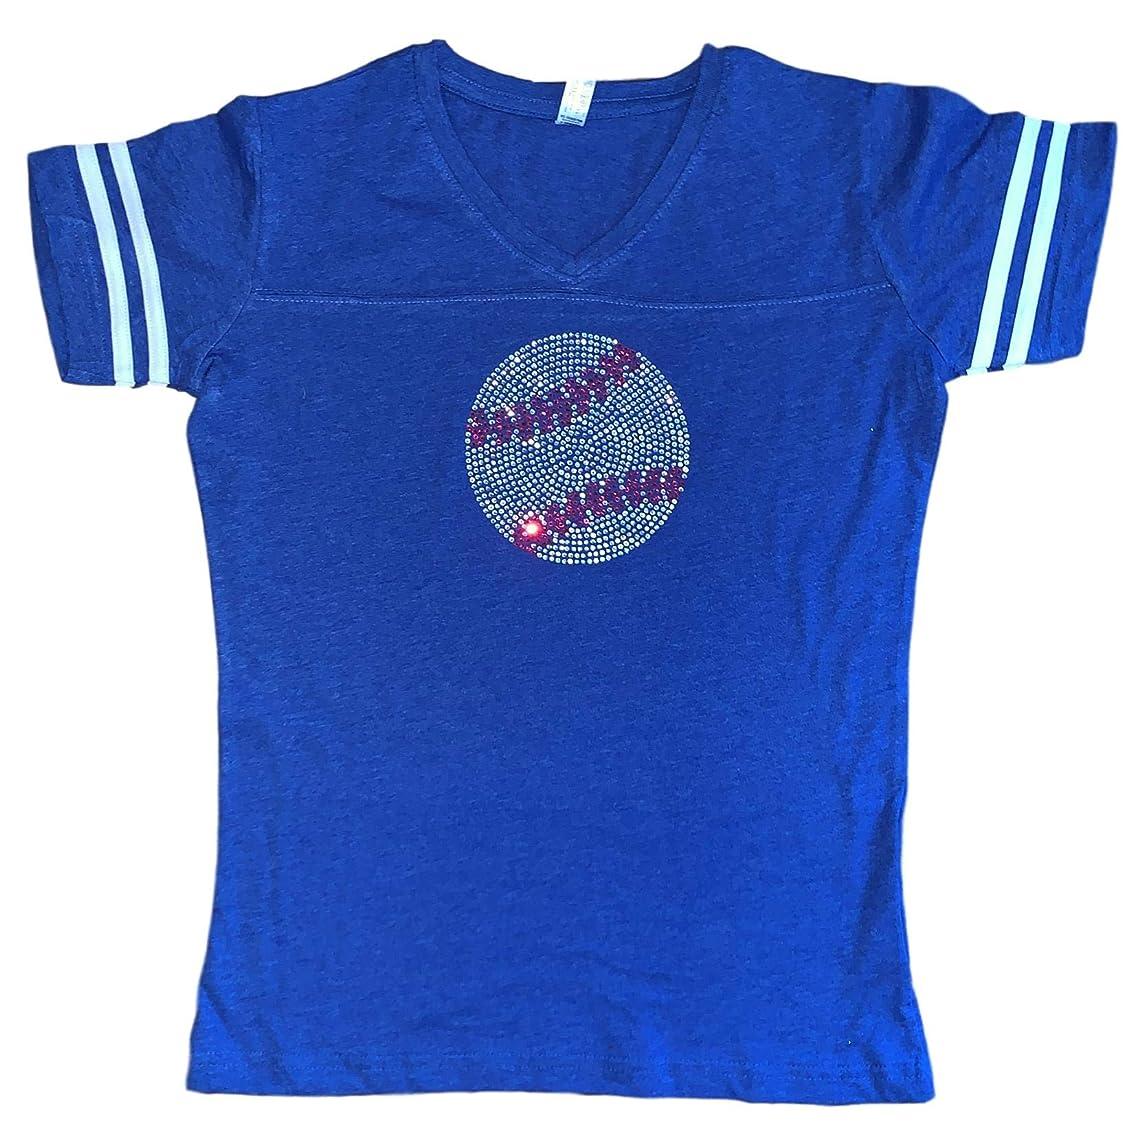 FanGarb Womens Plus Size Rhinestone Bedazzled Baseball v-Neck tee Shirt